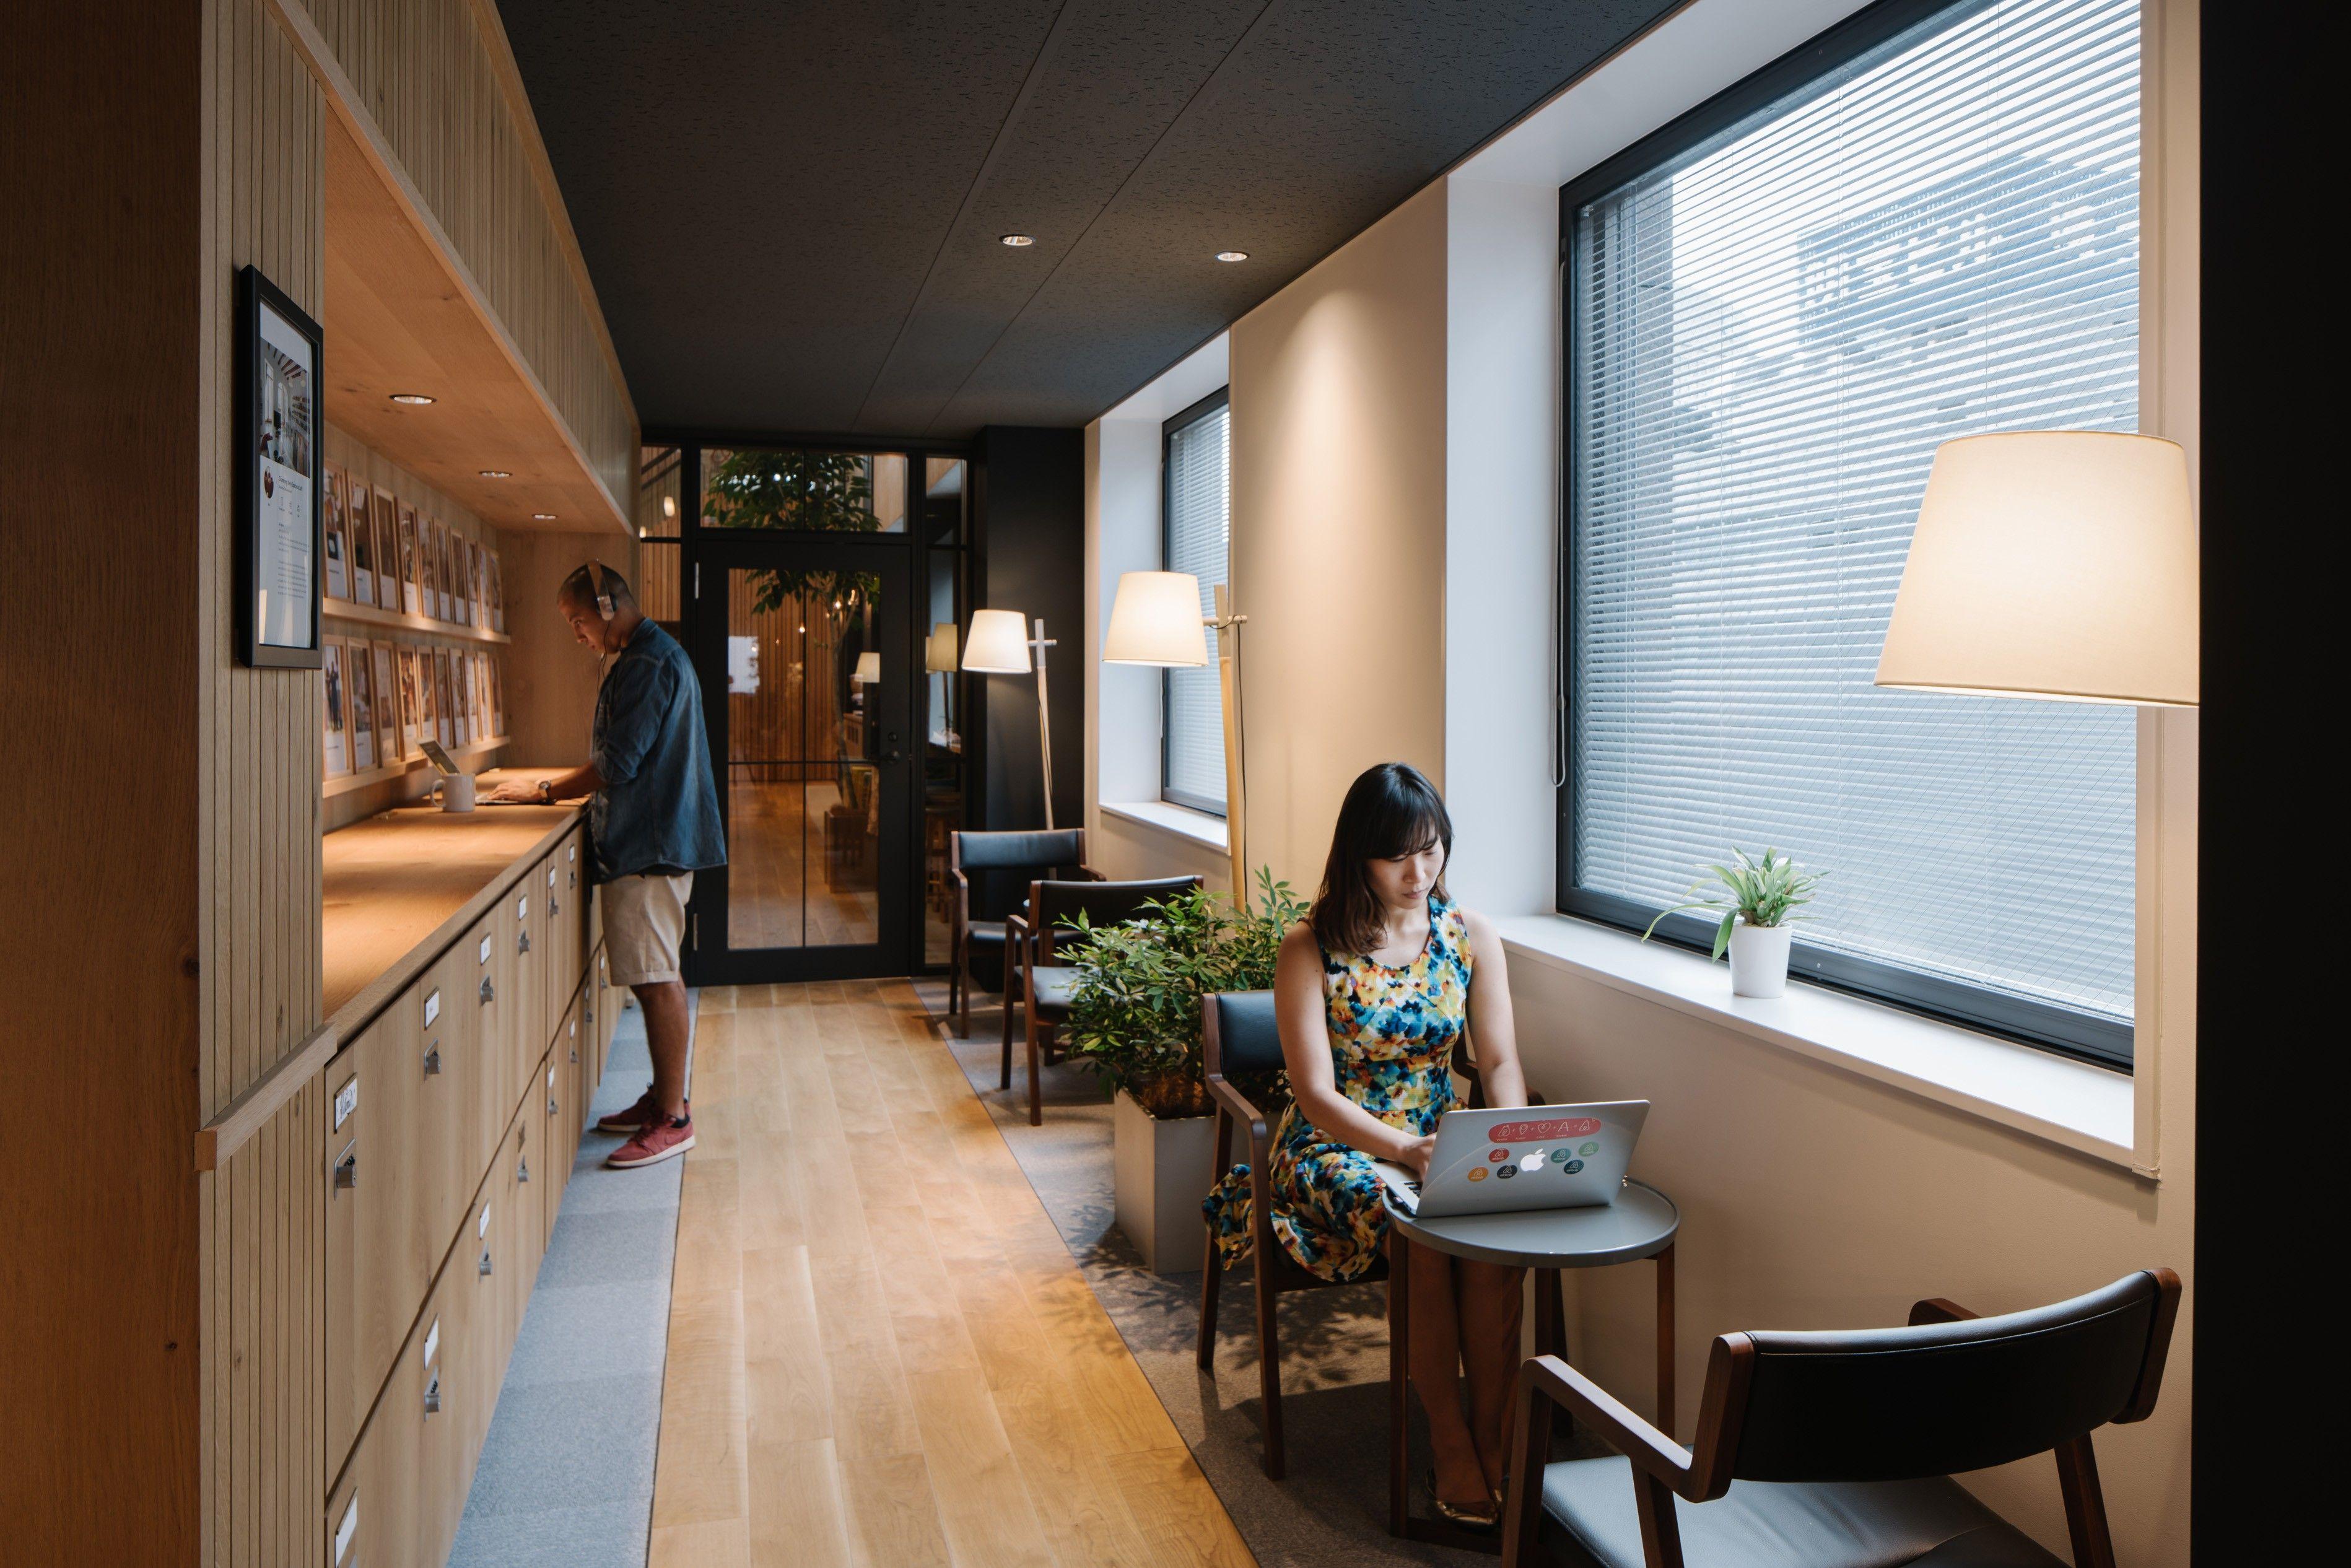 Self-Care | Office interior design. Airbnb office. Design